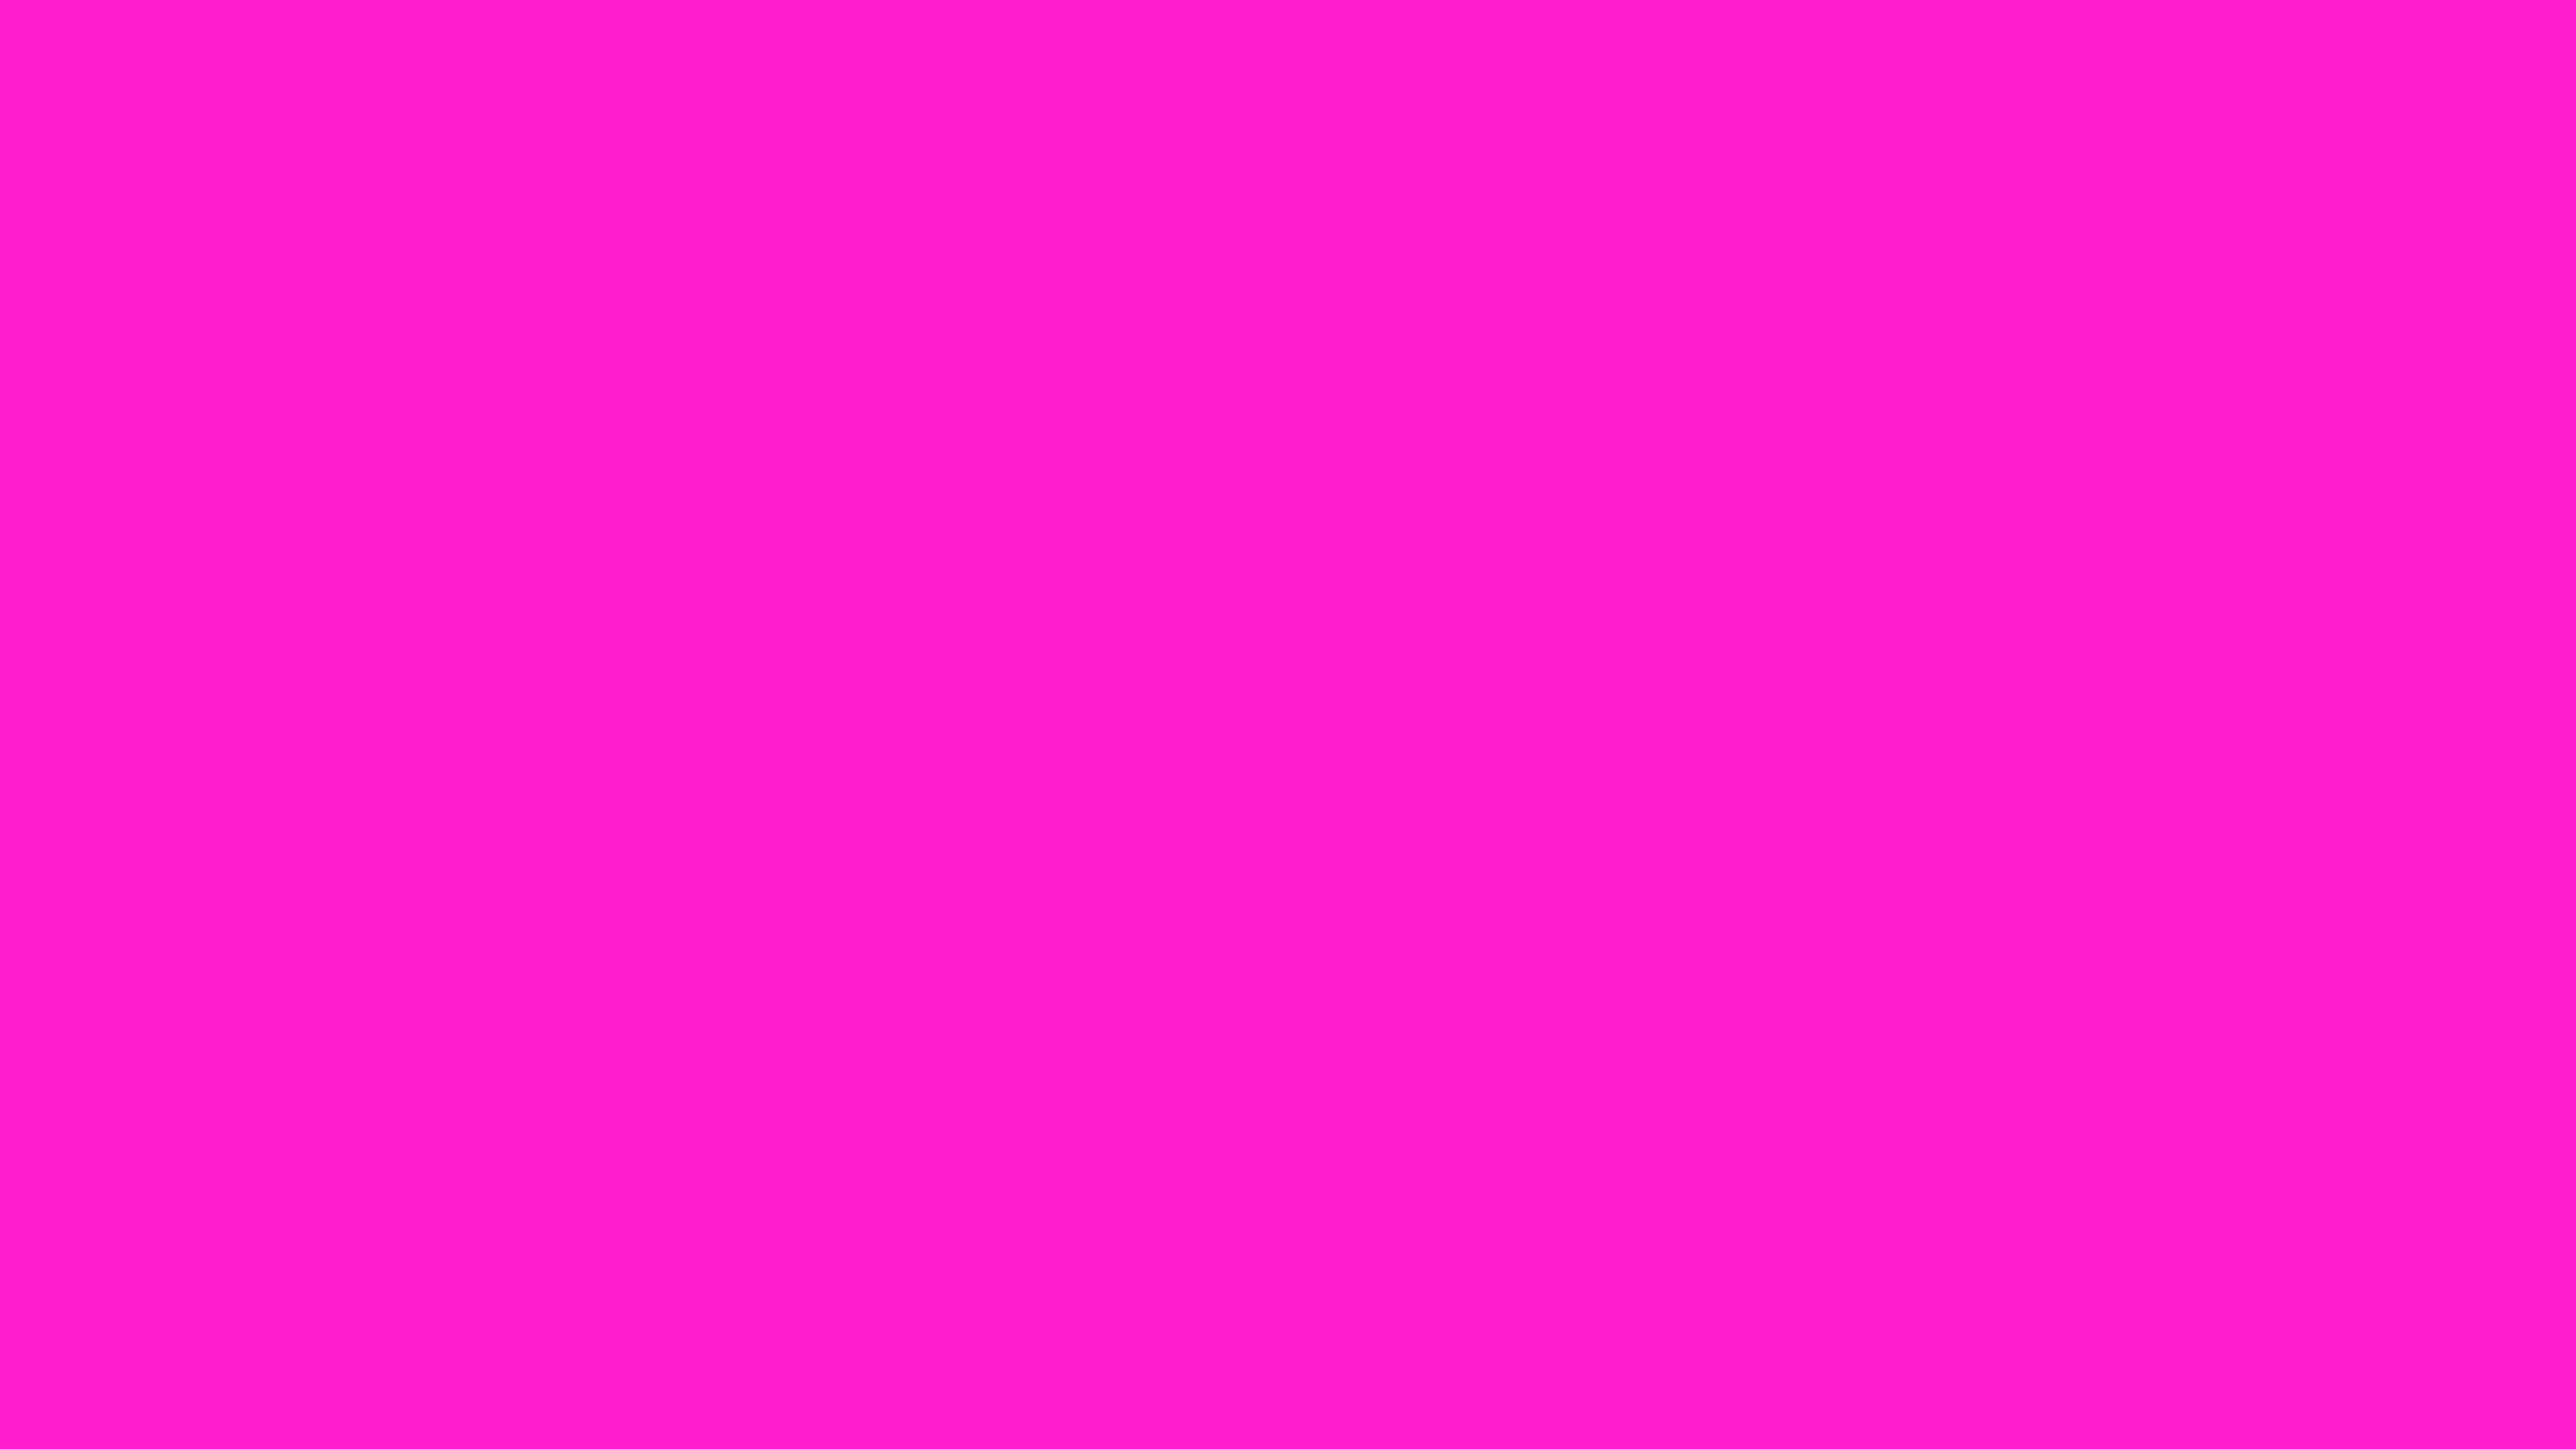 4096x2304 Hot Magenta Solid Color Background